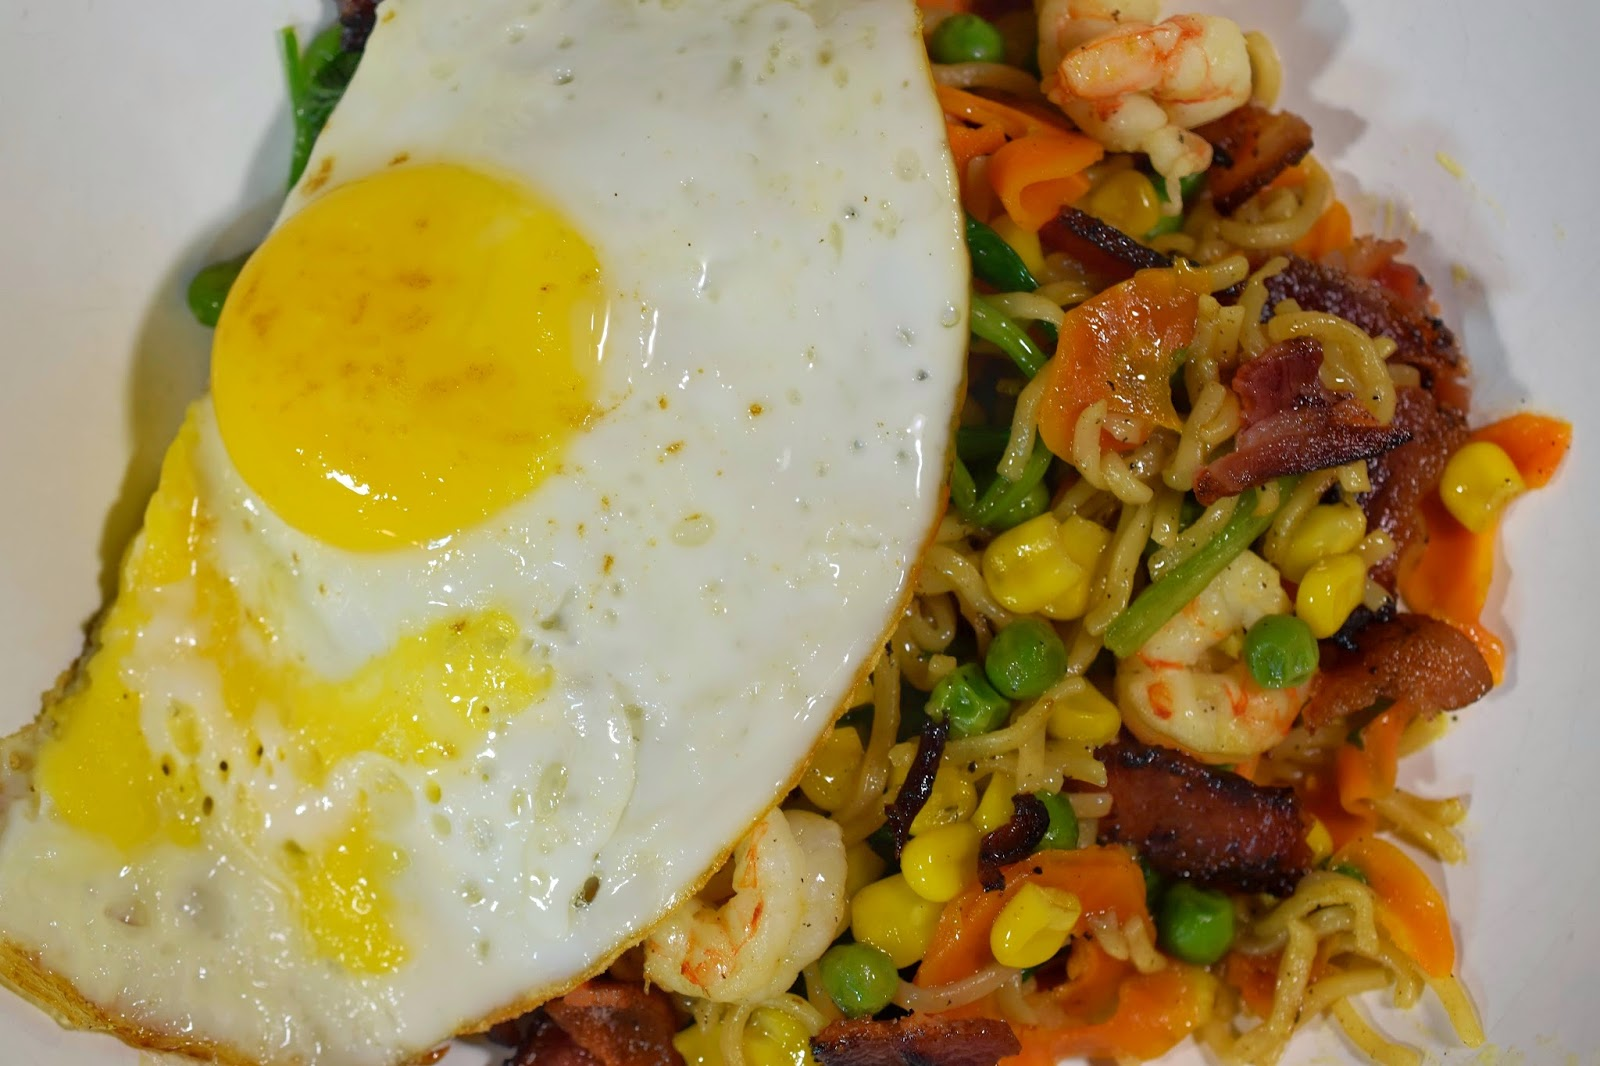 Shrimp Ramen Stir-fry with Bacon and Eggs